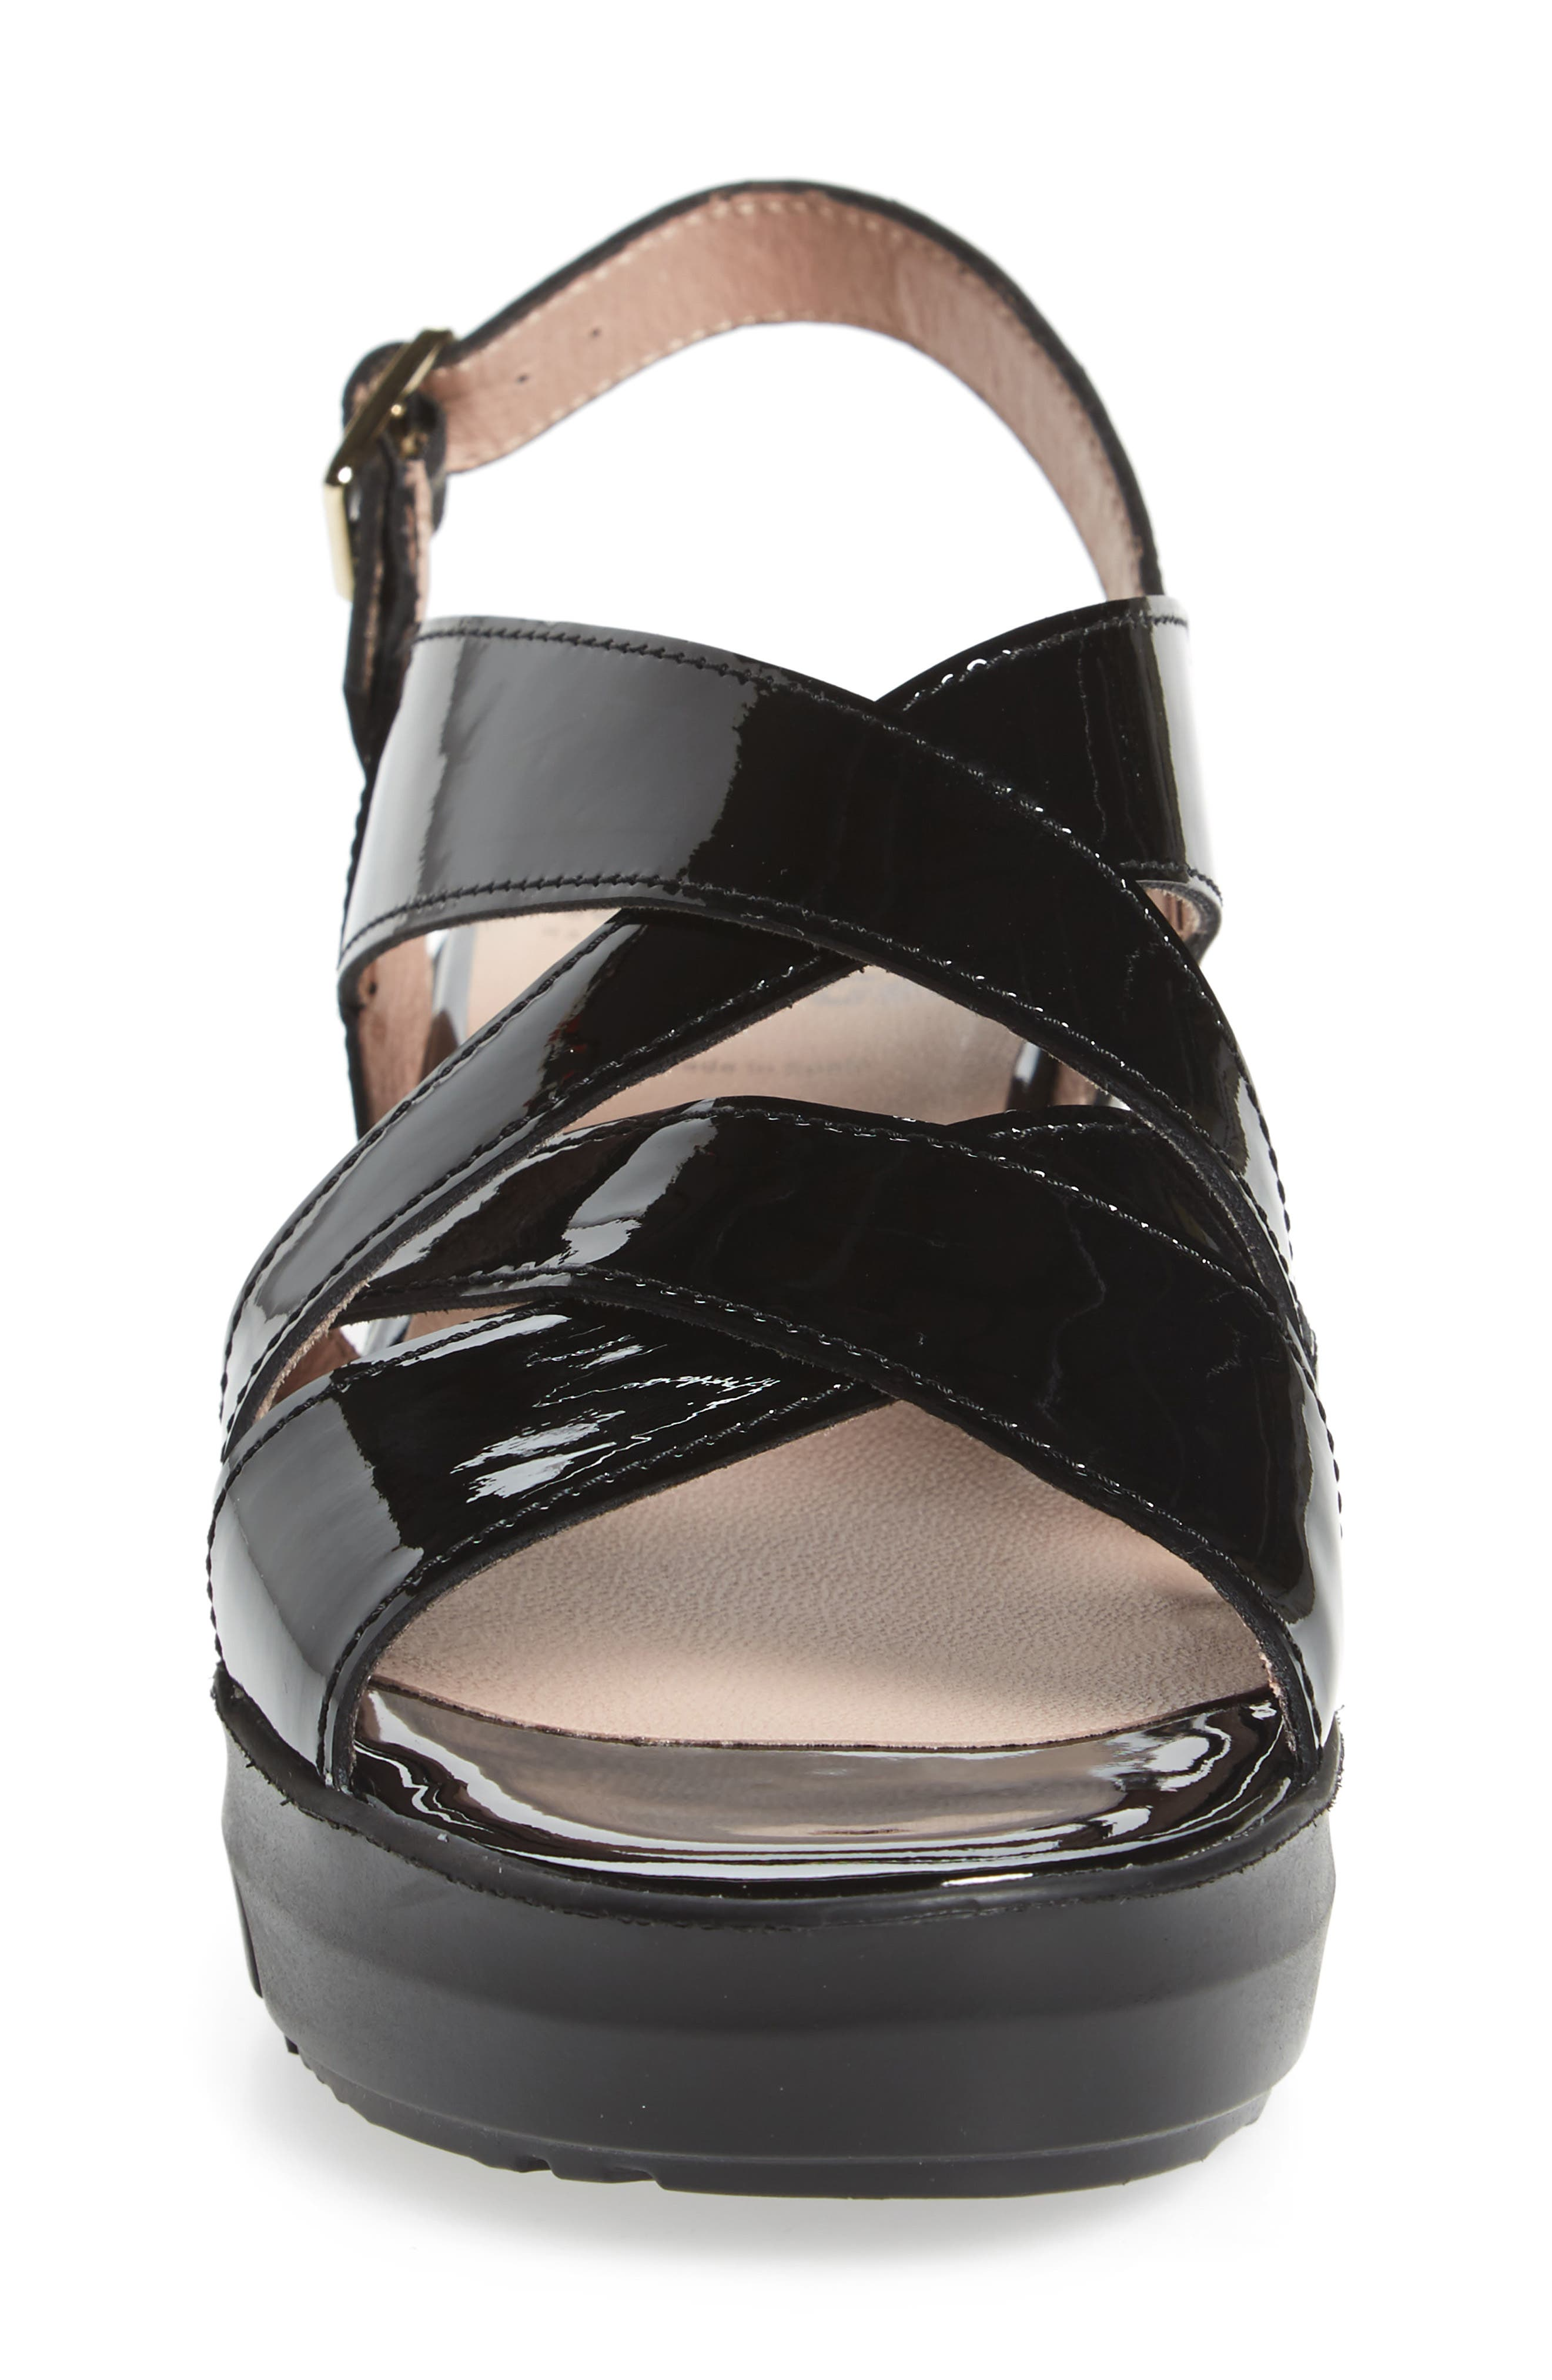 Platform Wedge Sandal,                             Alternate thumbnail 4, color,                             BLACK LEATHER